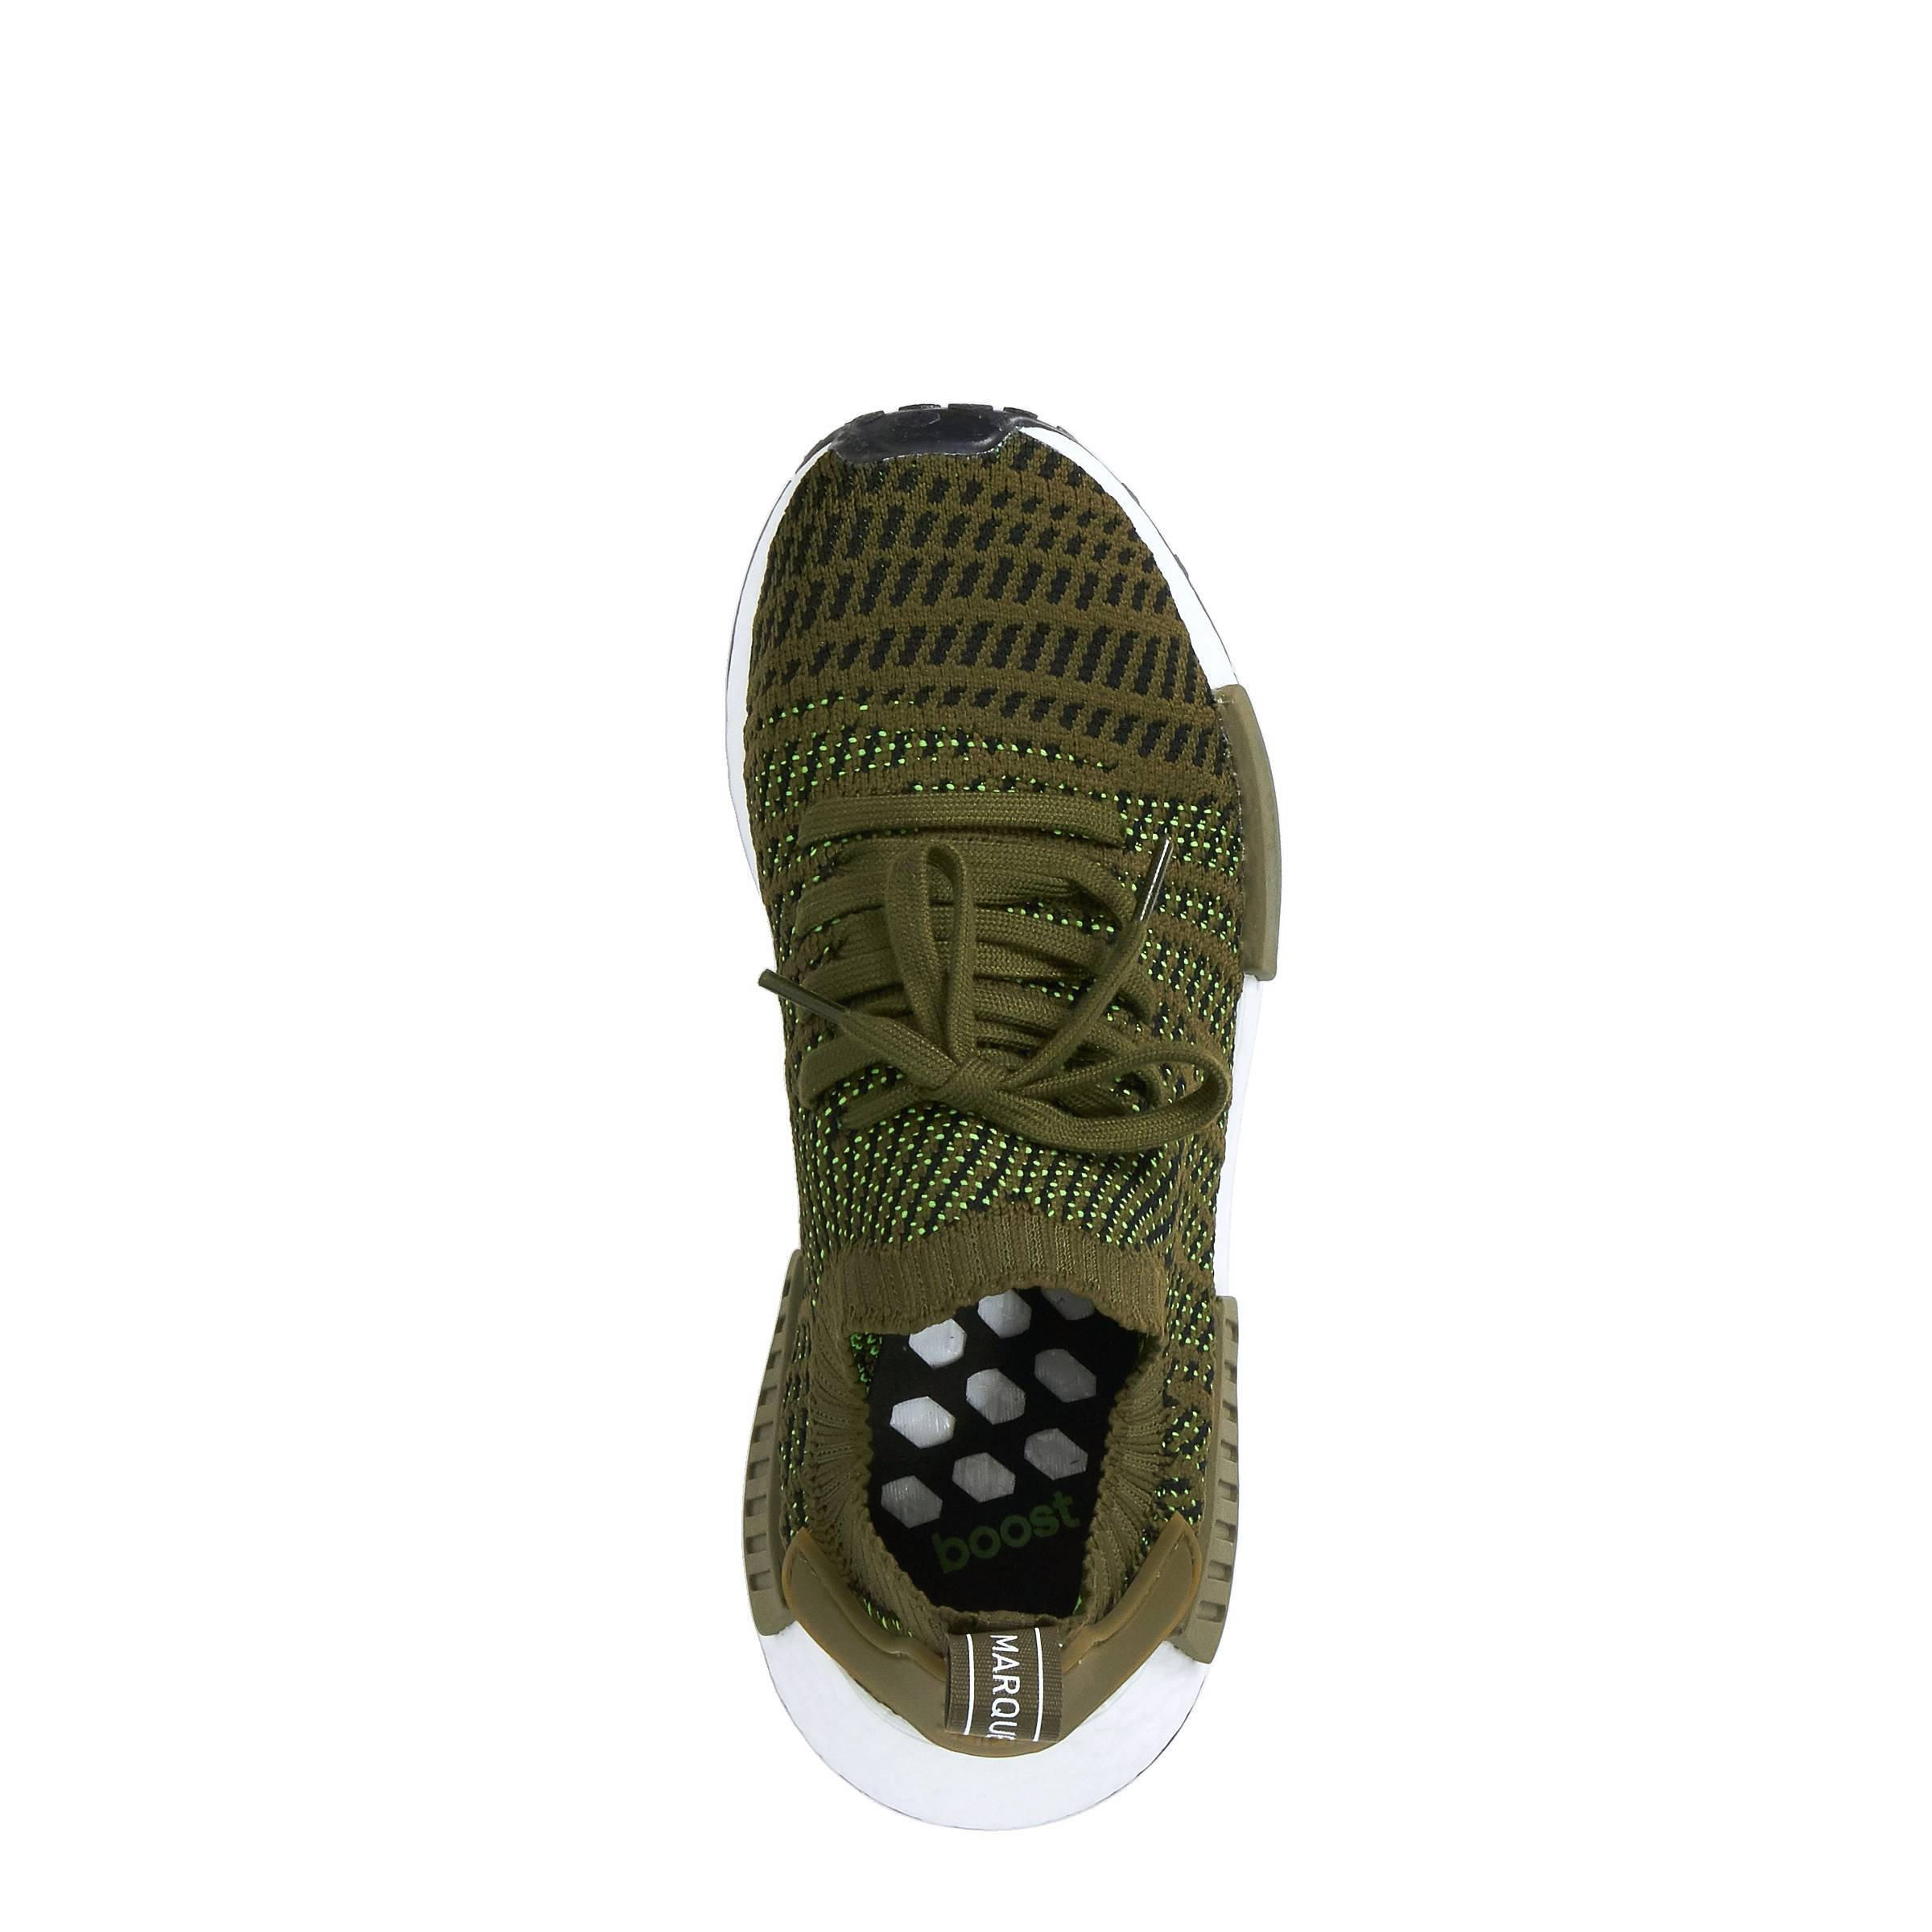 quality design 615c5 22fb6 Sneakers Wehkamp Pk r1 Adidas Originals Stlt Nmd aWn8YZ0X